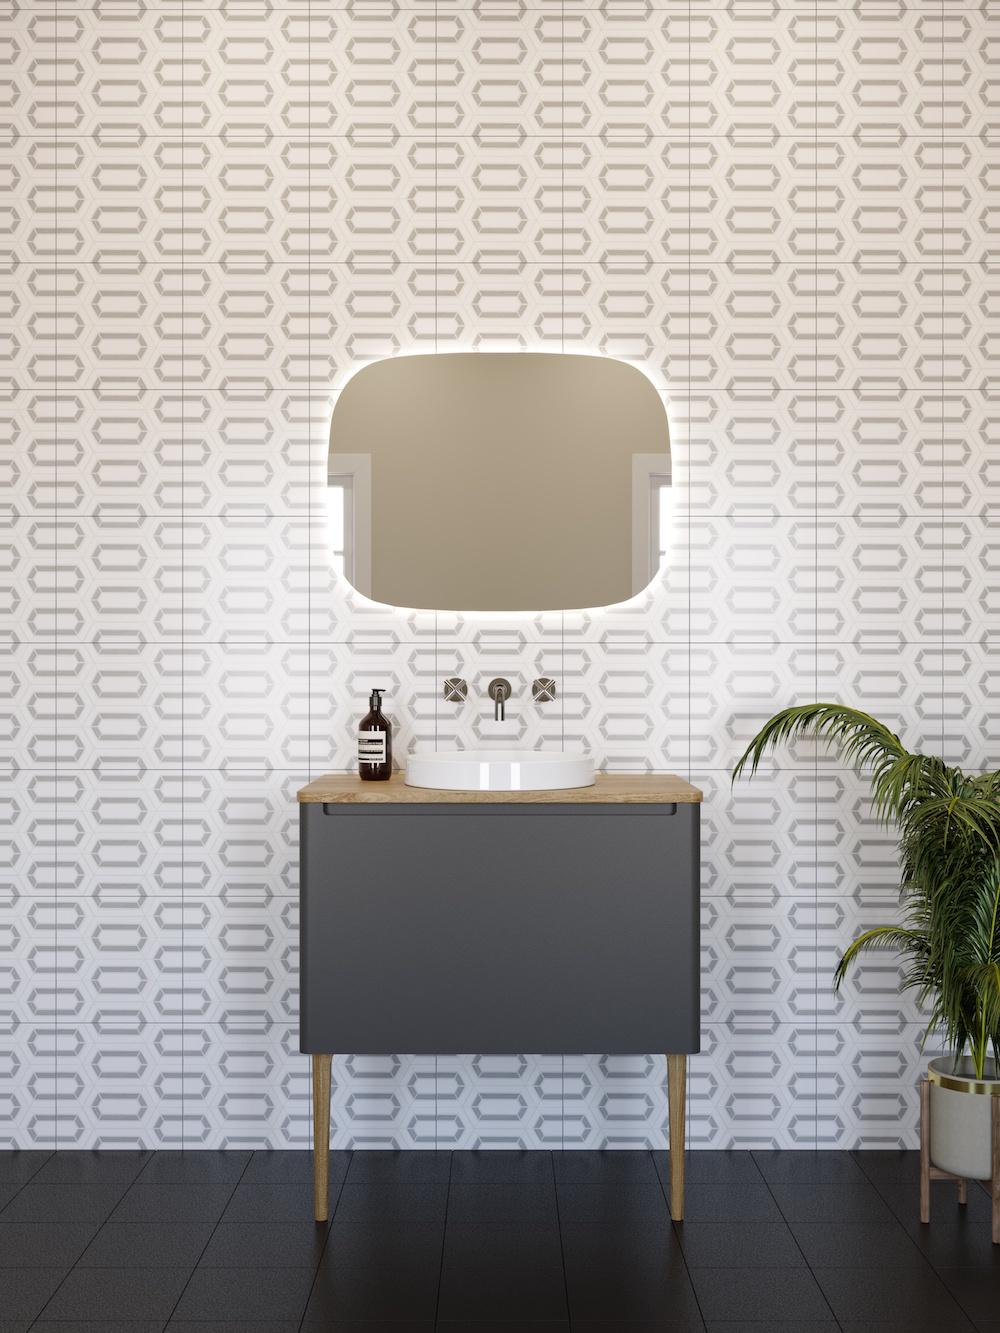 A black vanity sink in front of creative wallpaper